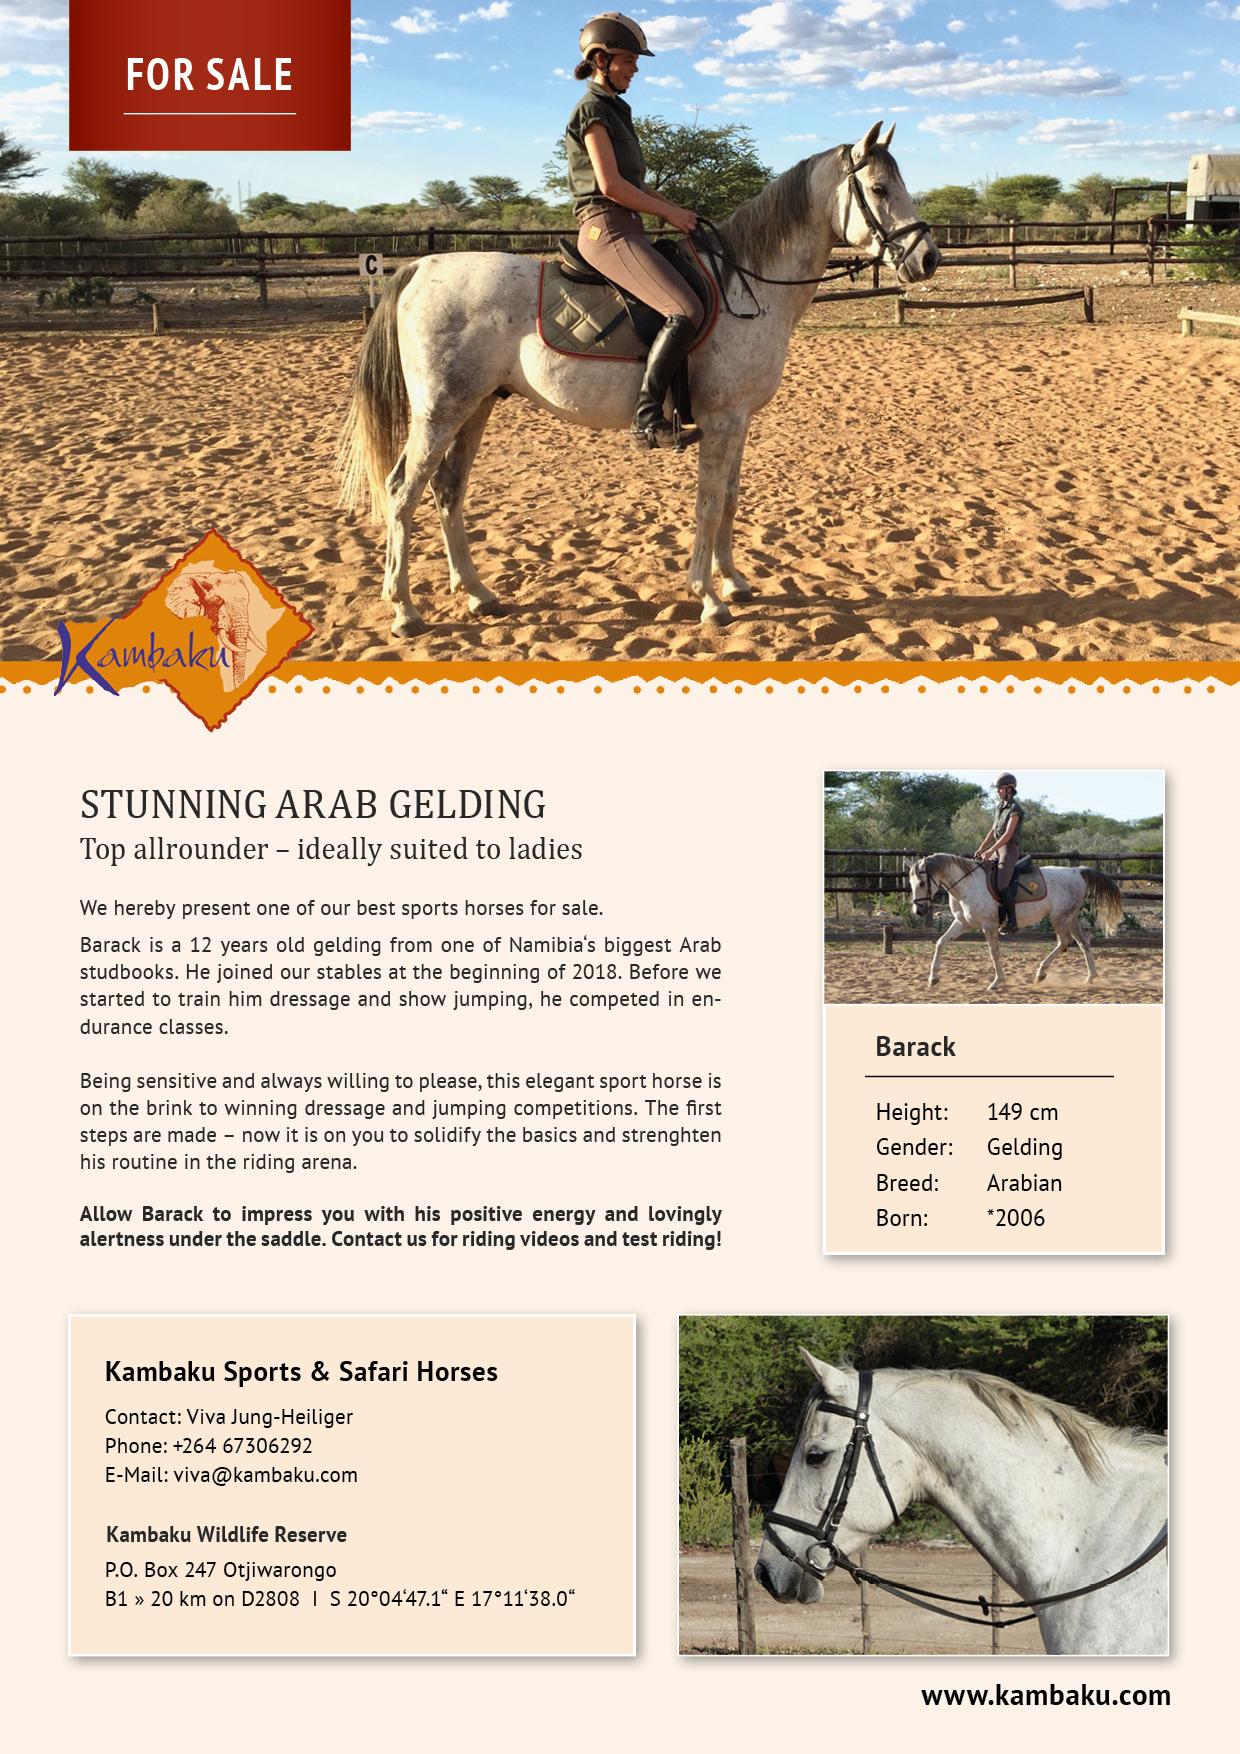 Namibian Horse - Horses for Sale